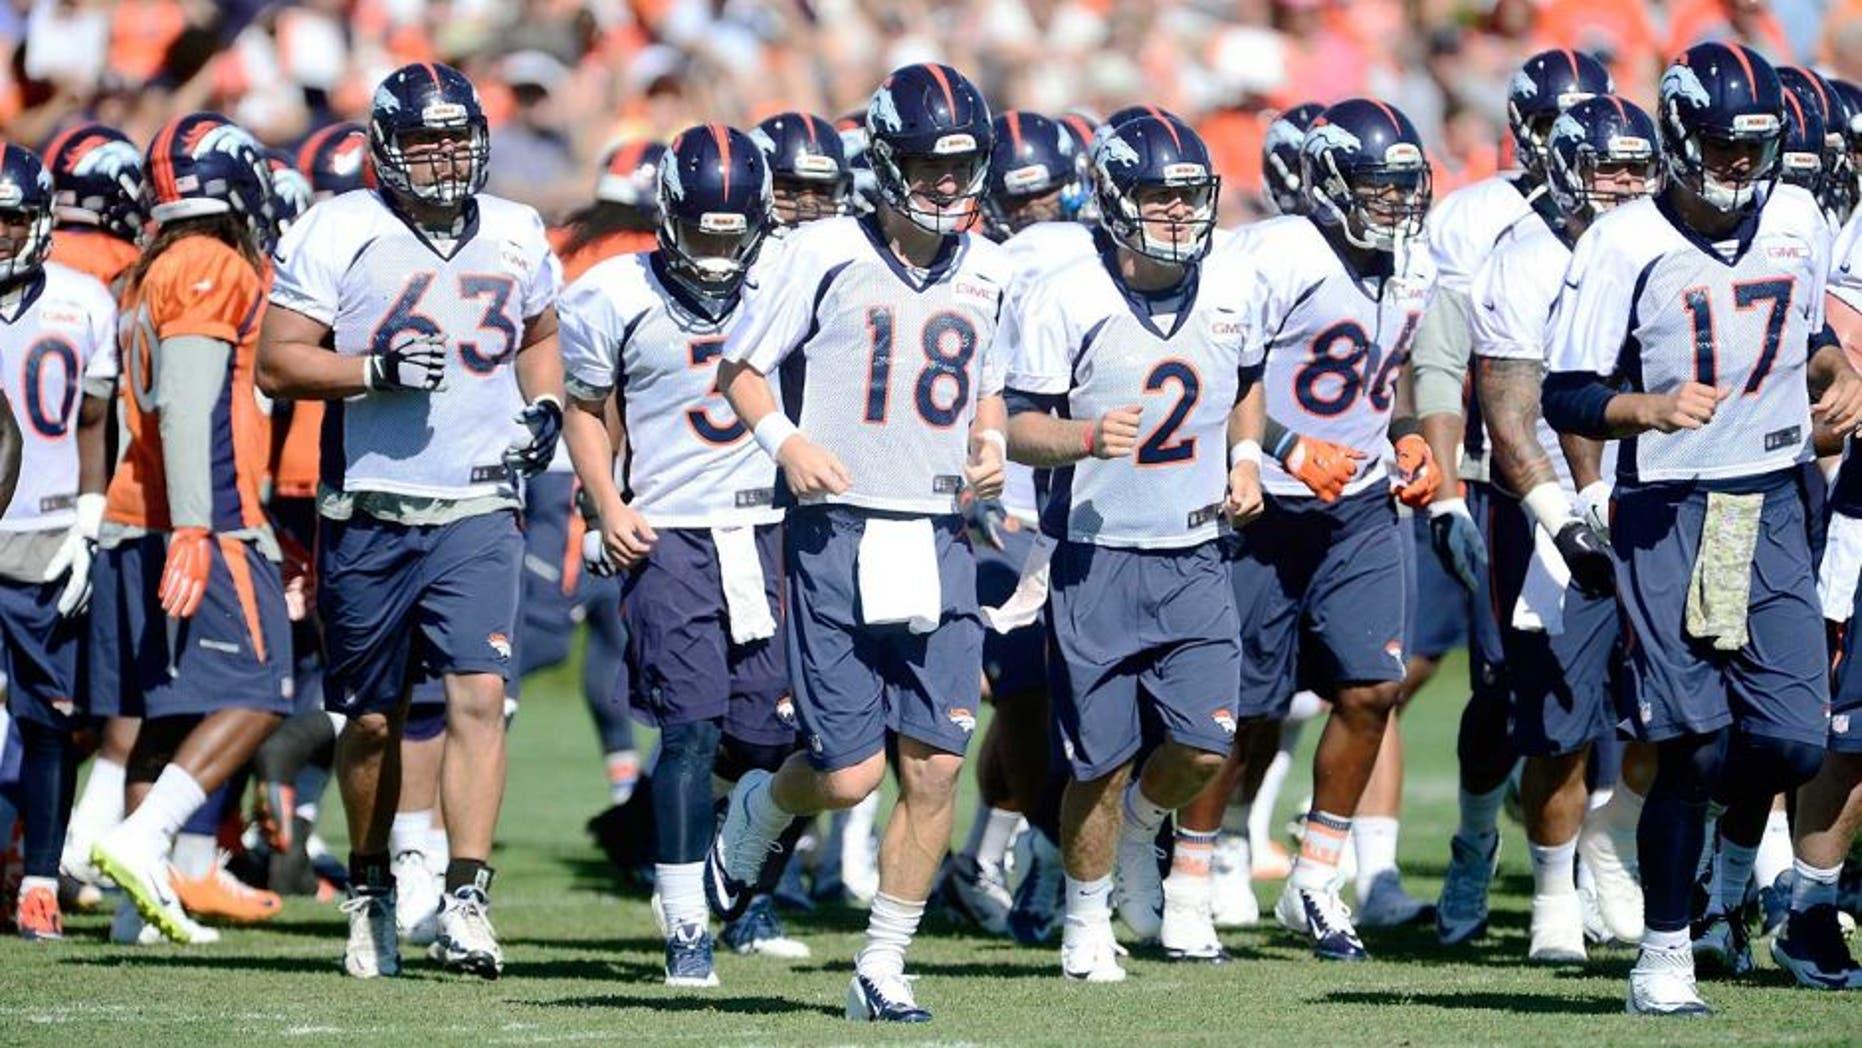 Aug 12, 2015; Englewood, CO, USA; Denver Broncos quarterback Peyton Manning (18), guard Ben Garland (63), quarterback Zac Dysert (2) and quarterback Brock Osweiler (17) warm up during training camp activities at the UCHealth Training Center. Mandatory Credit: Ron Chenoy-USA TODAY Sports